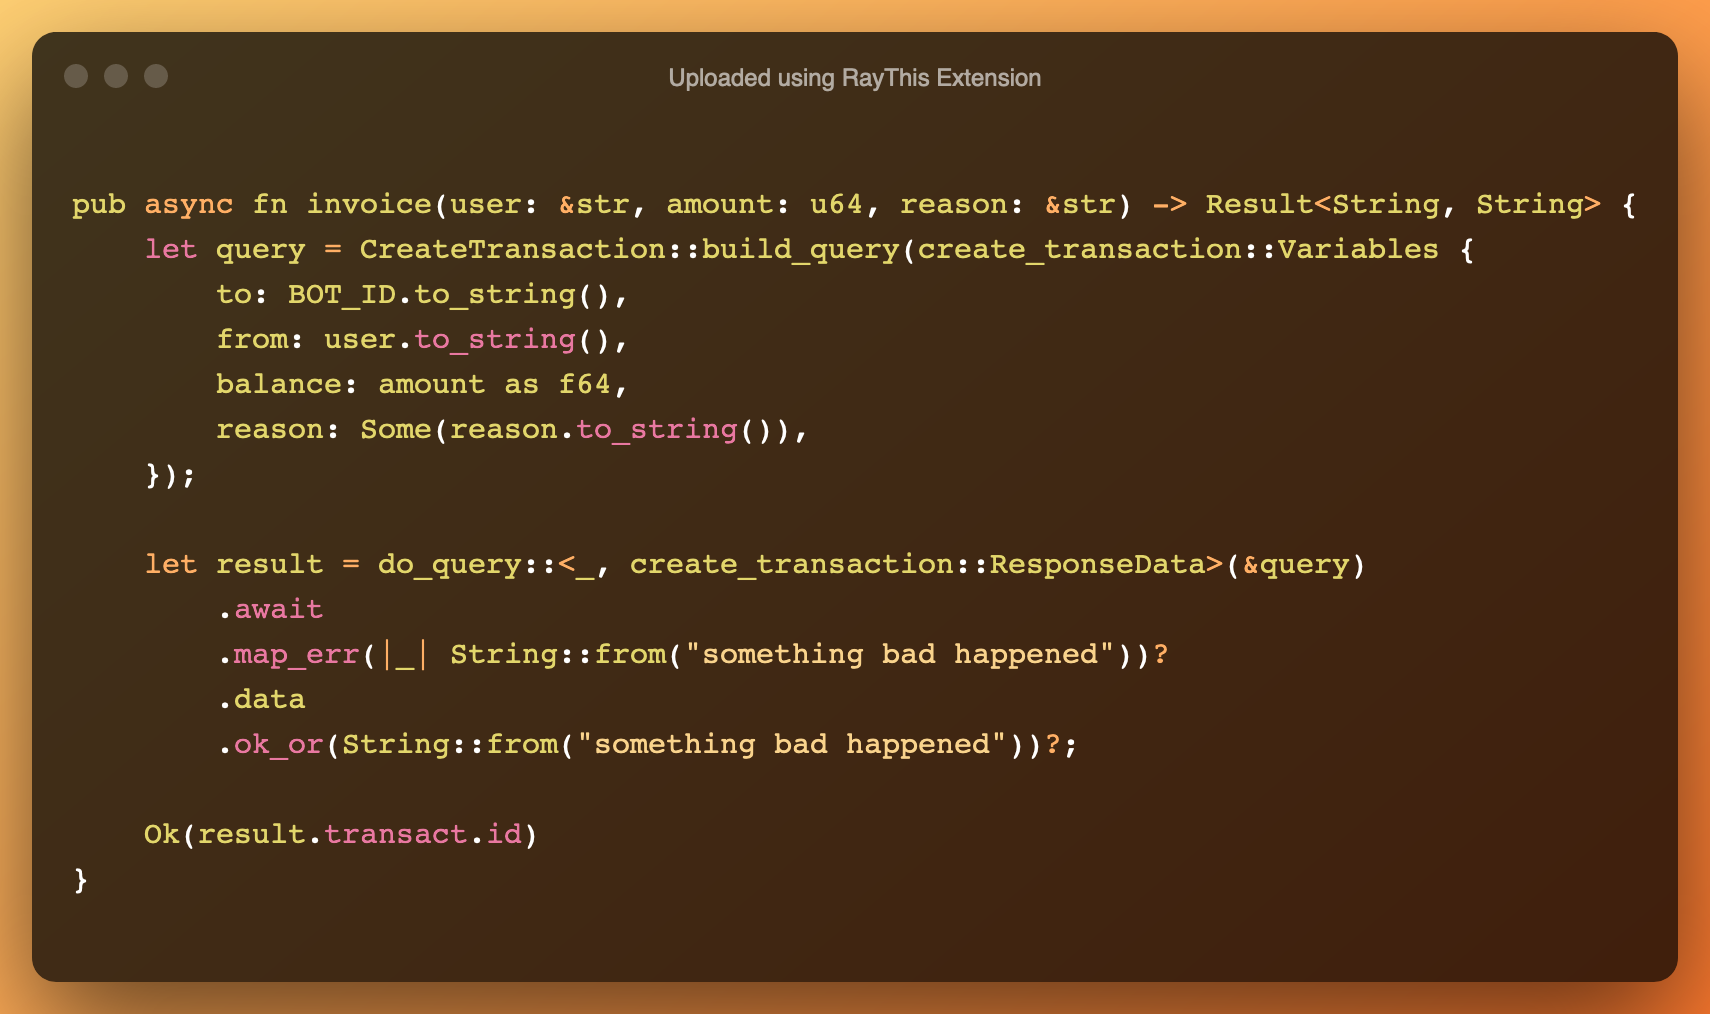 https://cloud-qbp263i31-hack-club-bot.vercel.app/0uploaded_using_raythis_extension.png